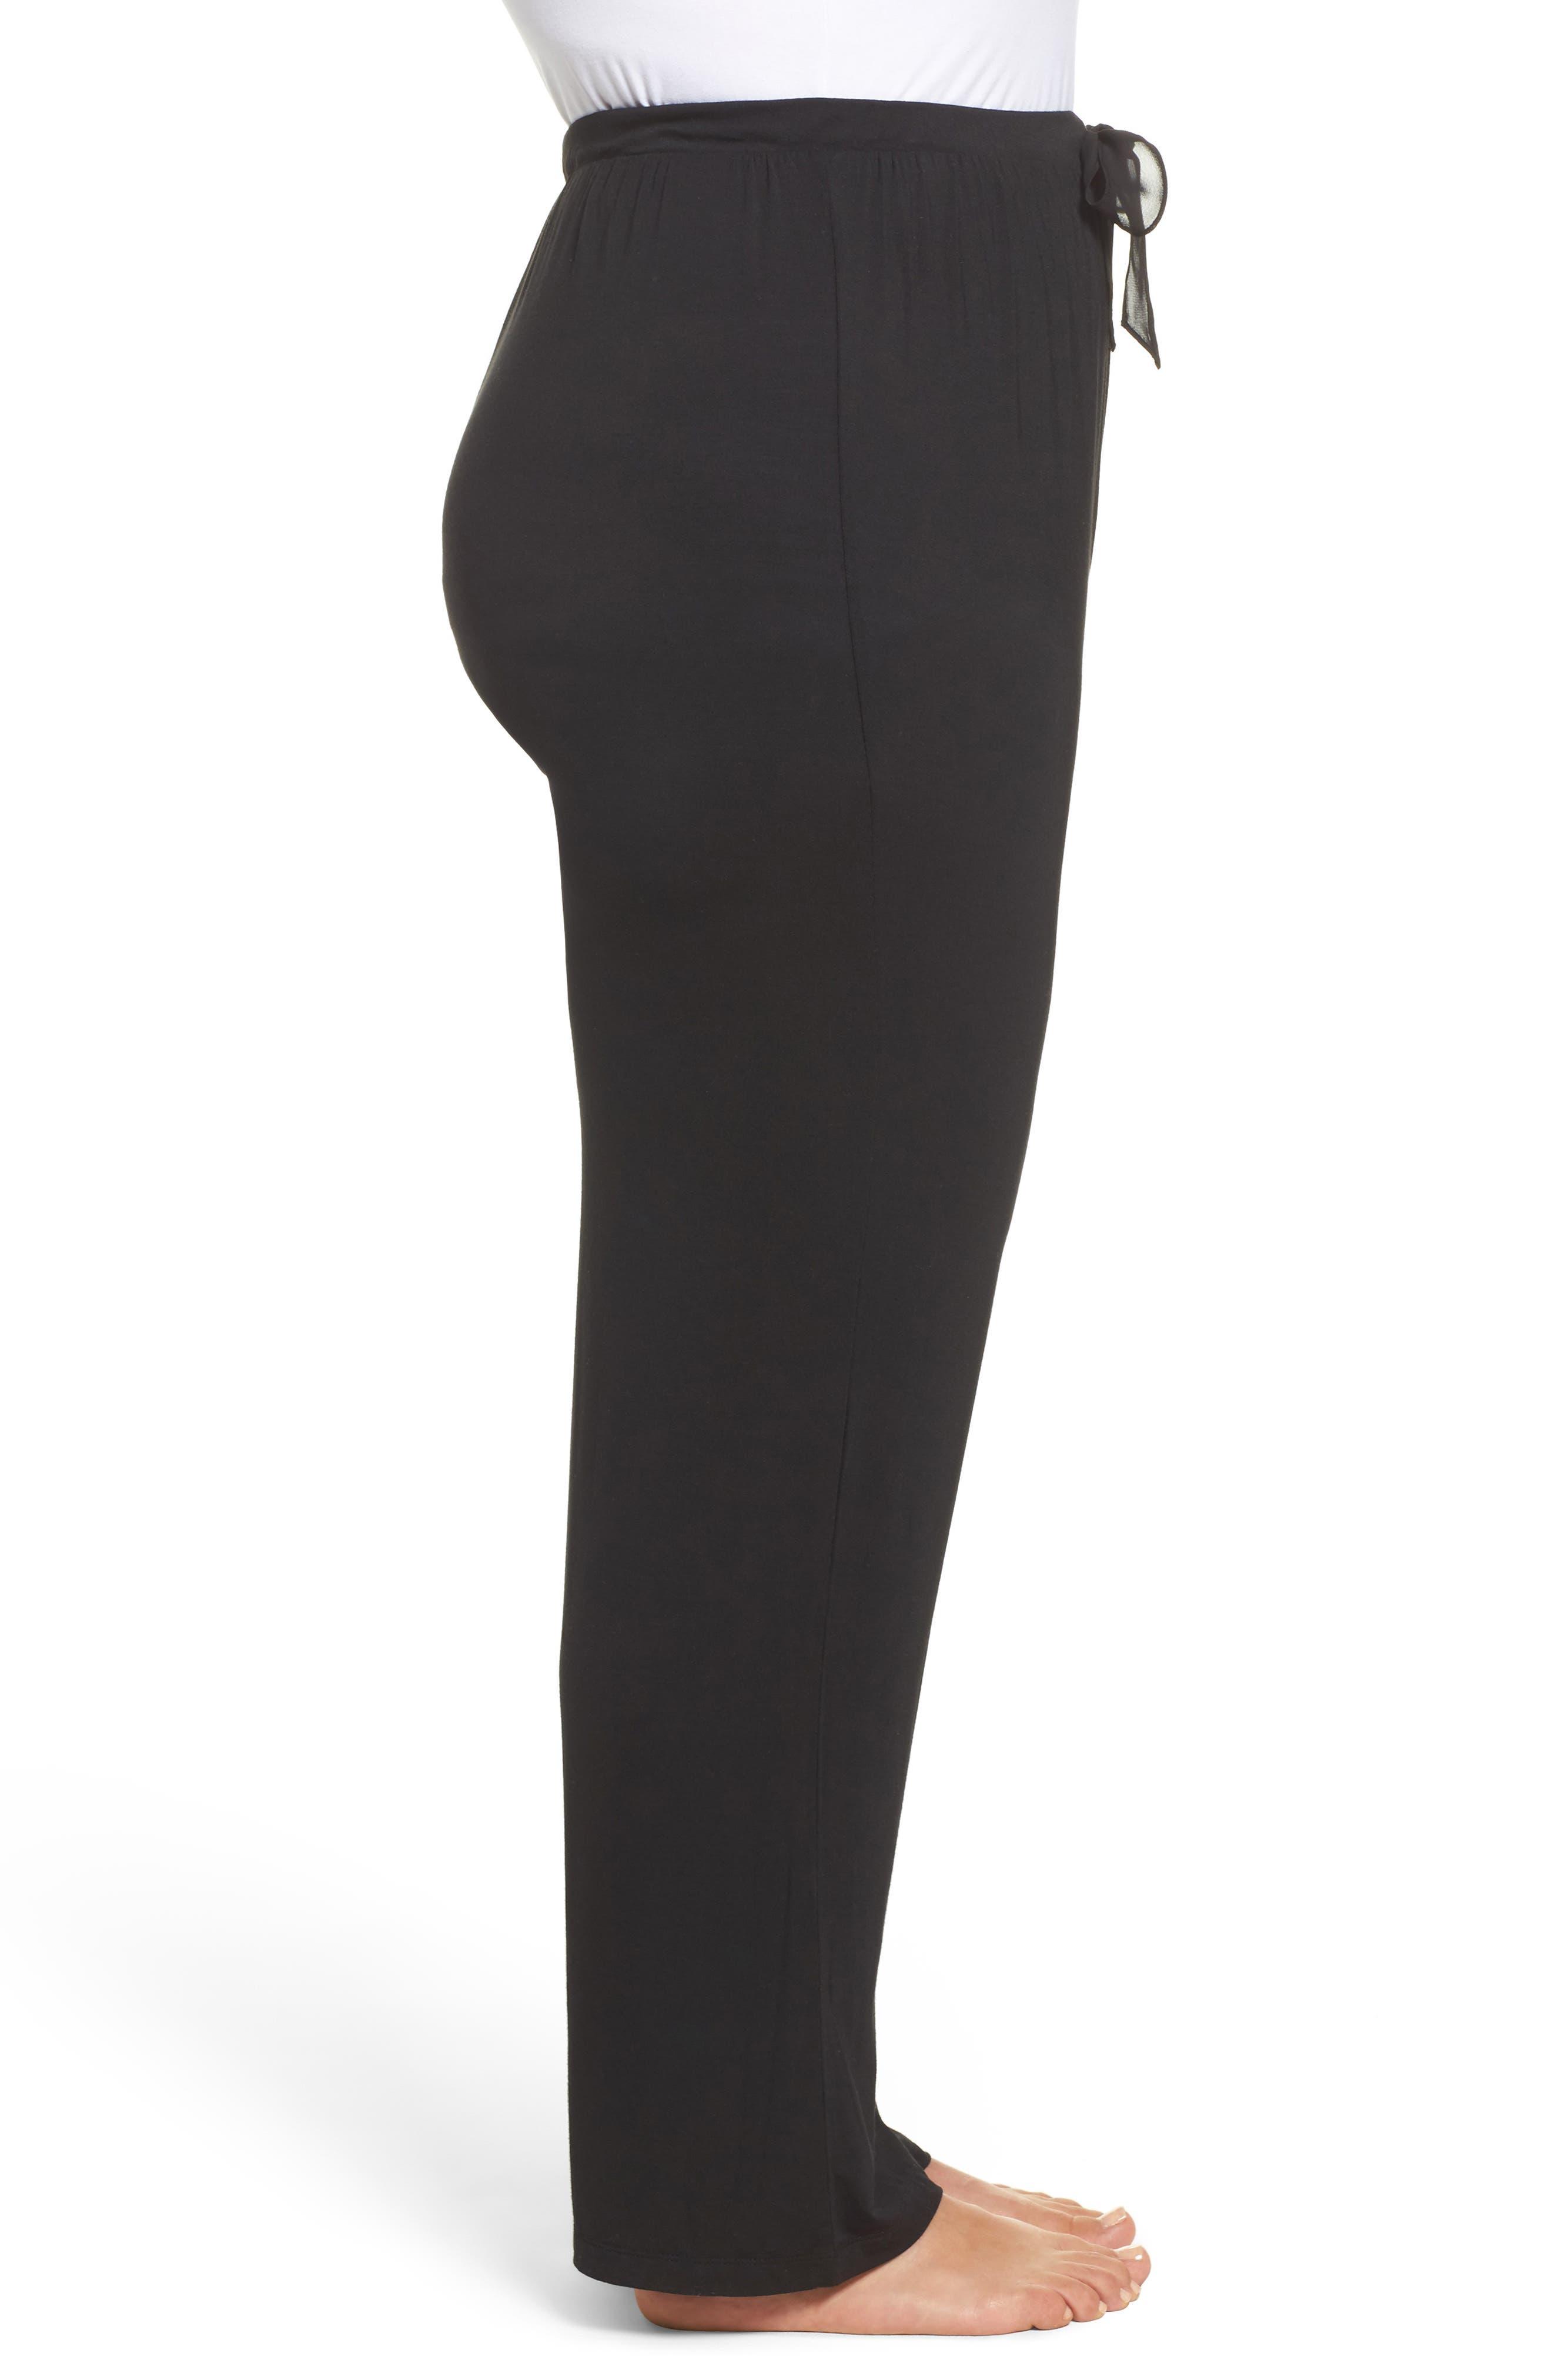 Stretch Modal Pants,                             Alternate thumbnail 3, color,                             001